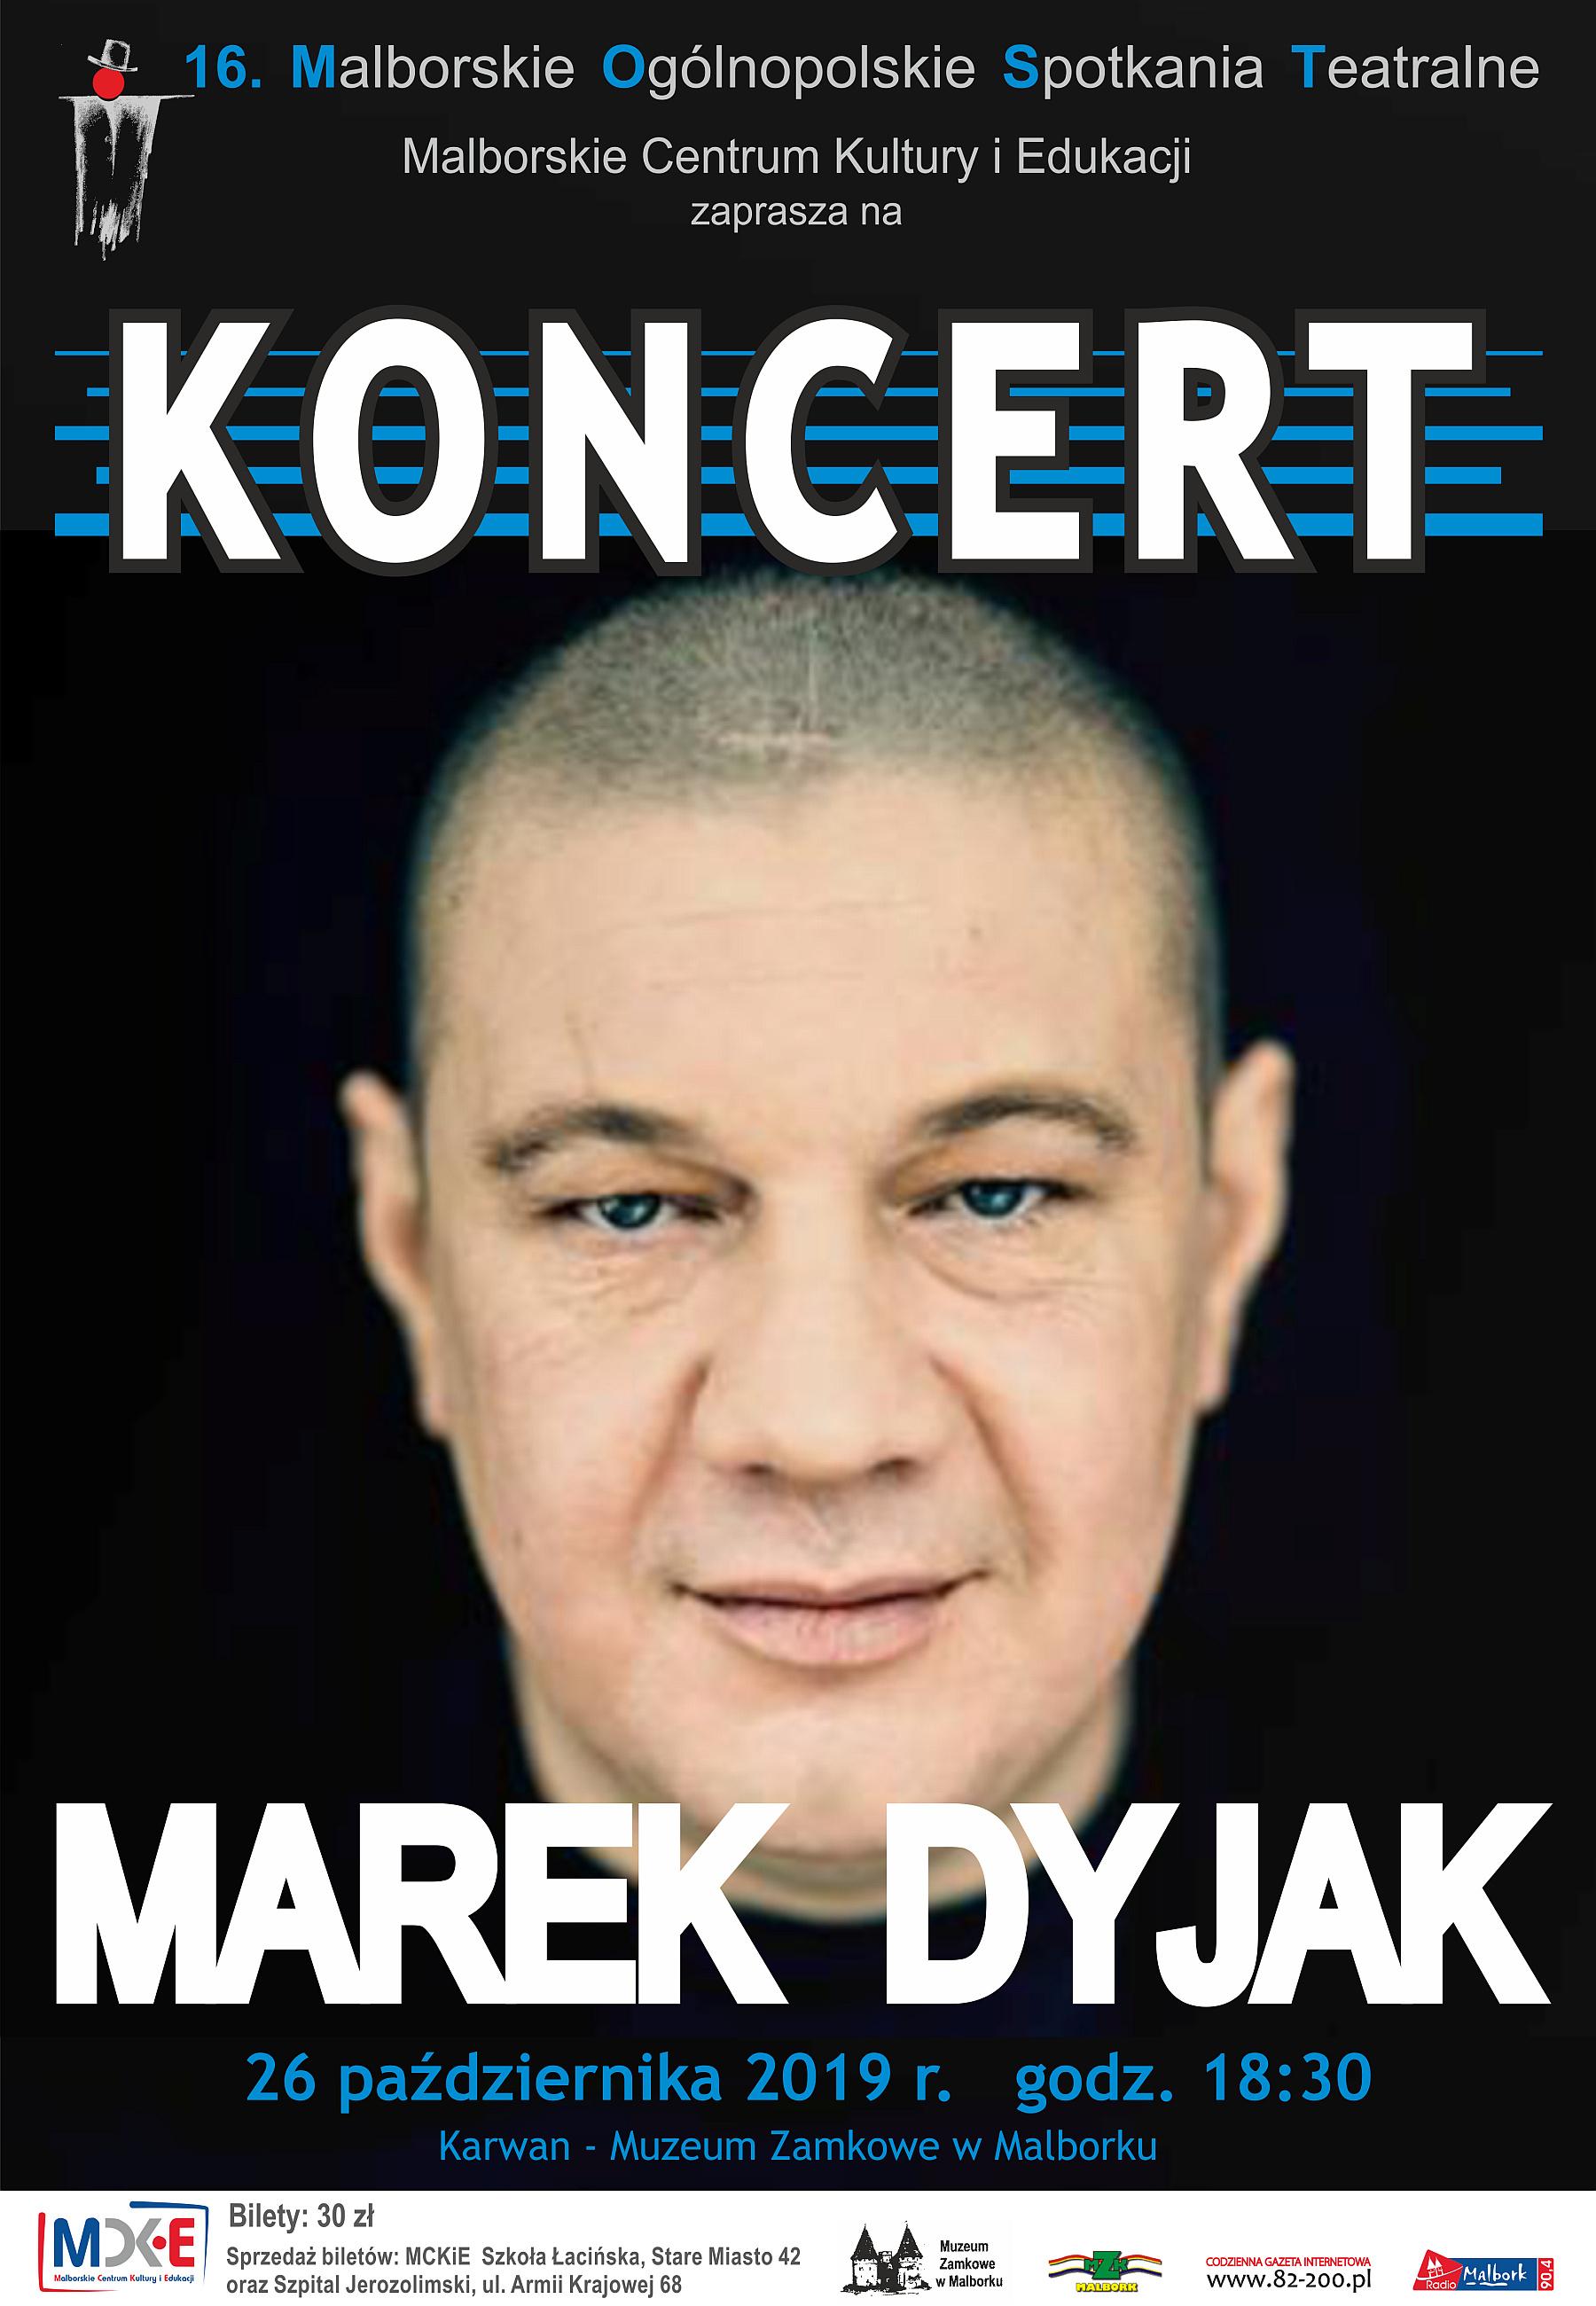 http://m.82-200.pl/2019/09/orig/dyjak-4952.jpg